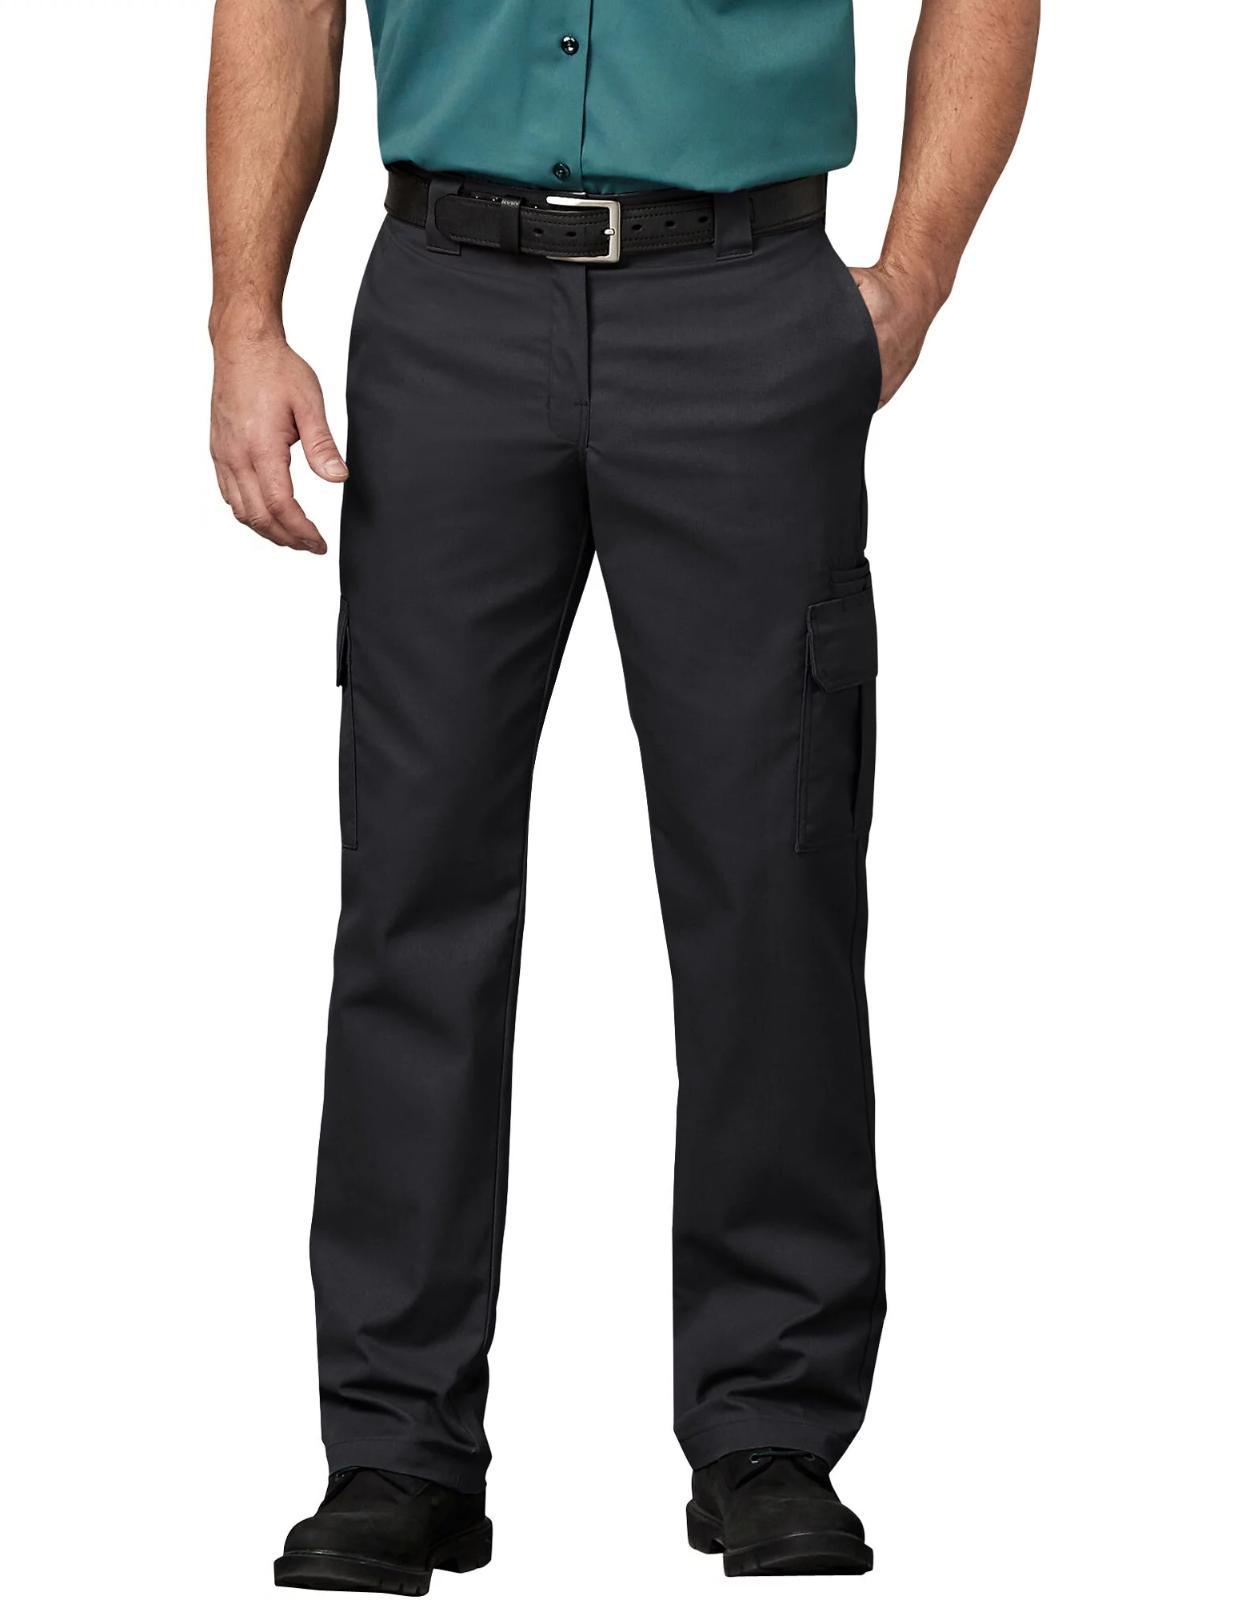 Dickies Mens Pants Regular Fit Leg Work Cargo Twill Pants